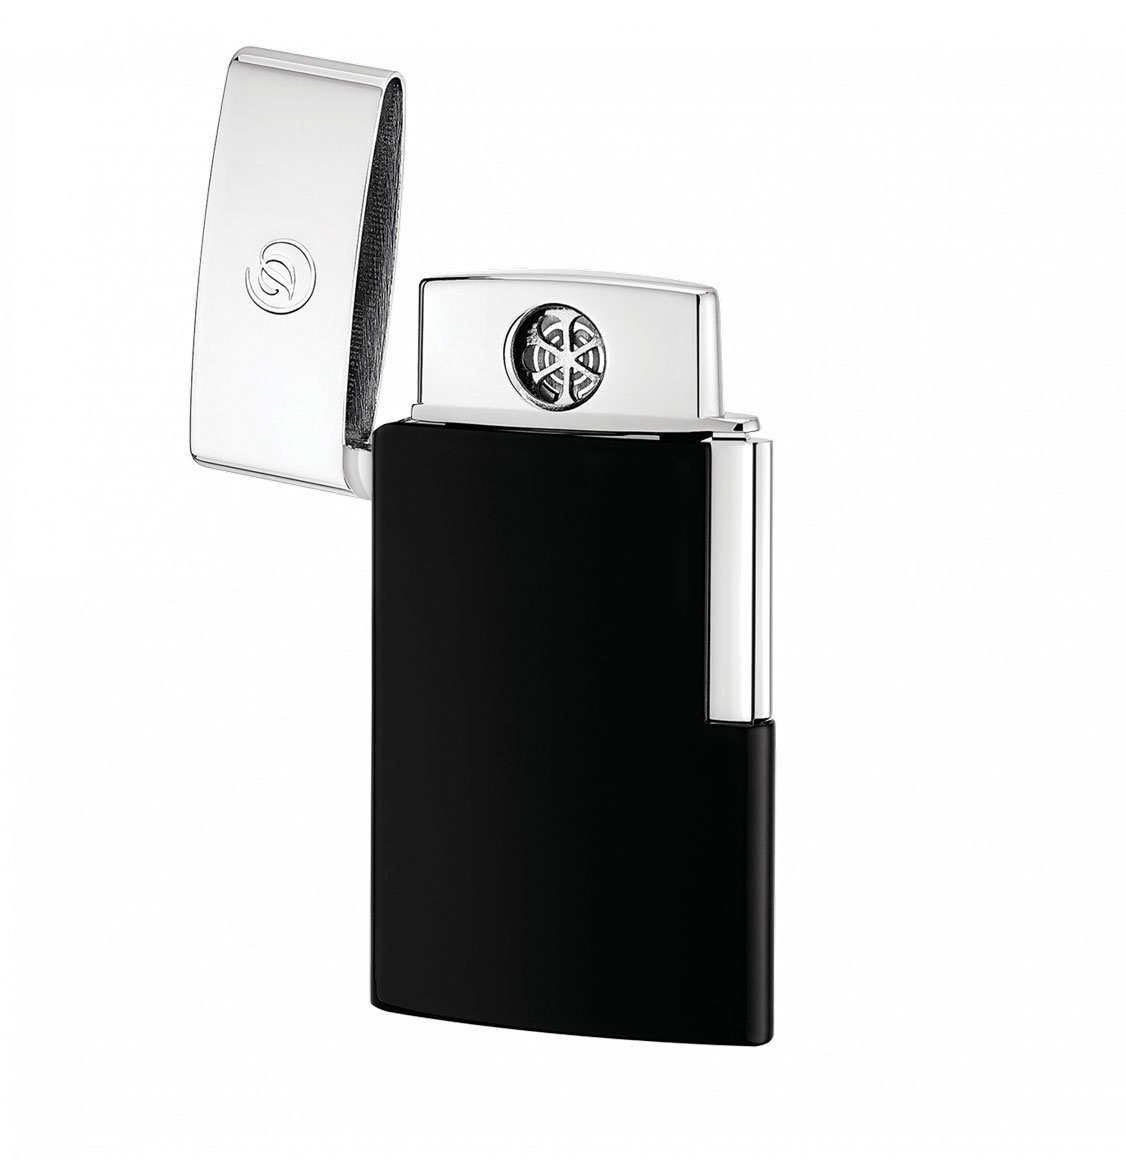 S.T. Dupont Αναπτήρας E-Slim Black Chrome Lighter